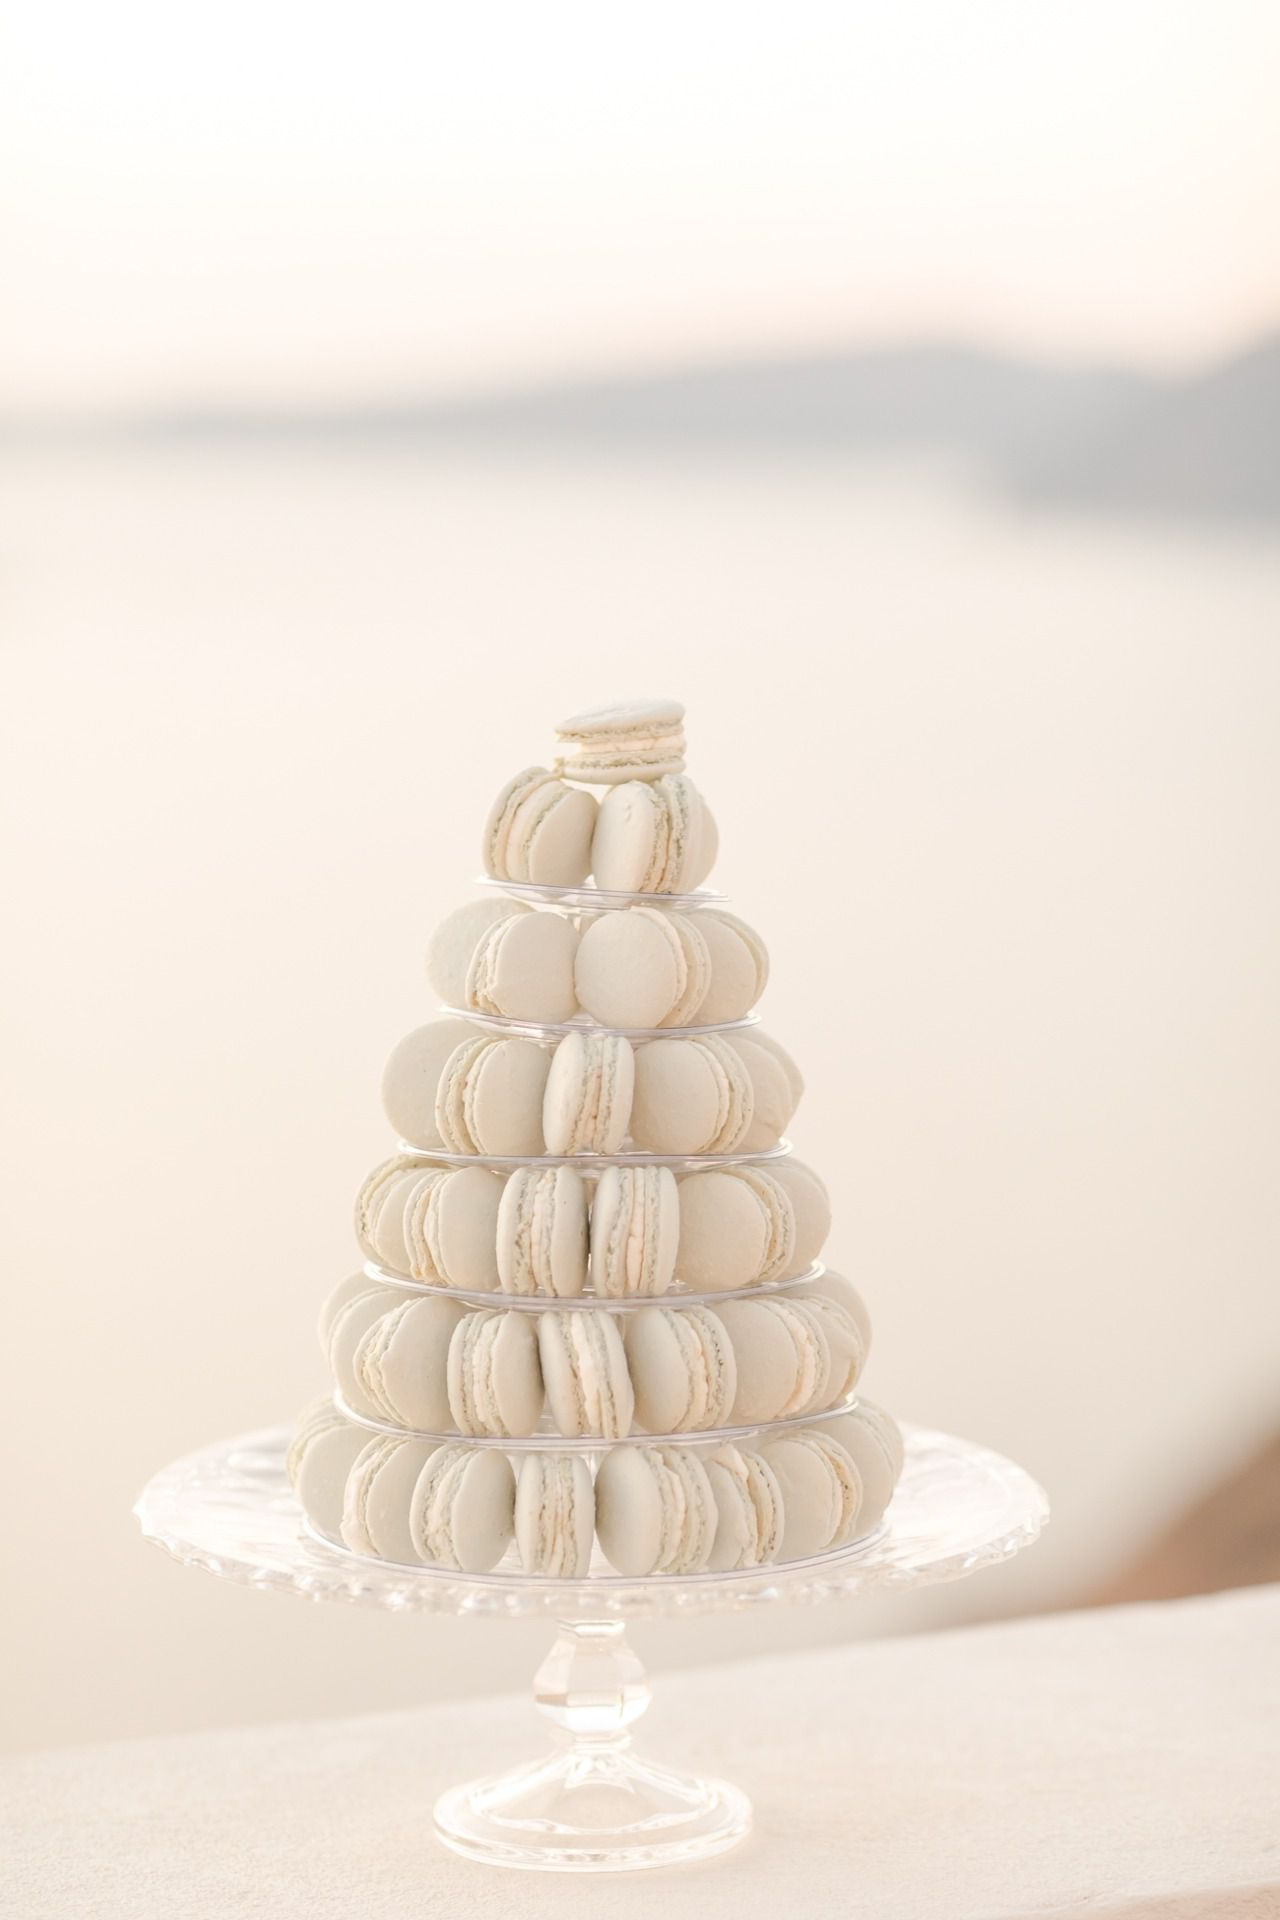 Neutral macaron tower